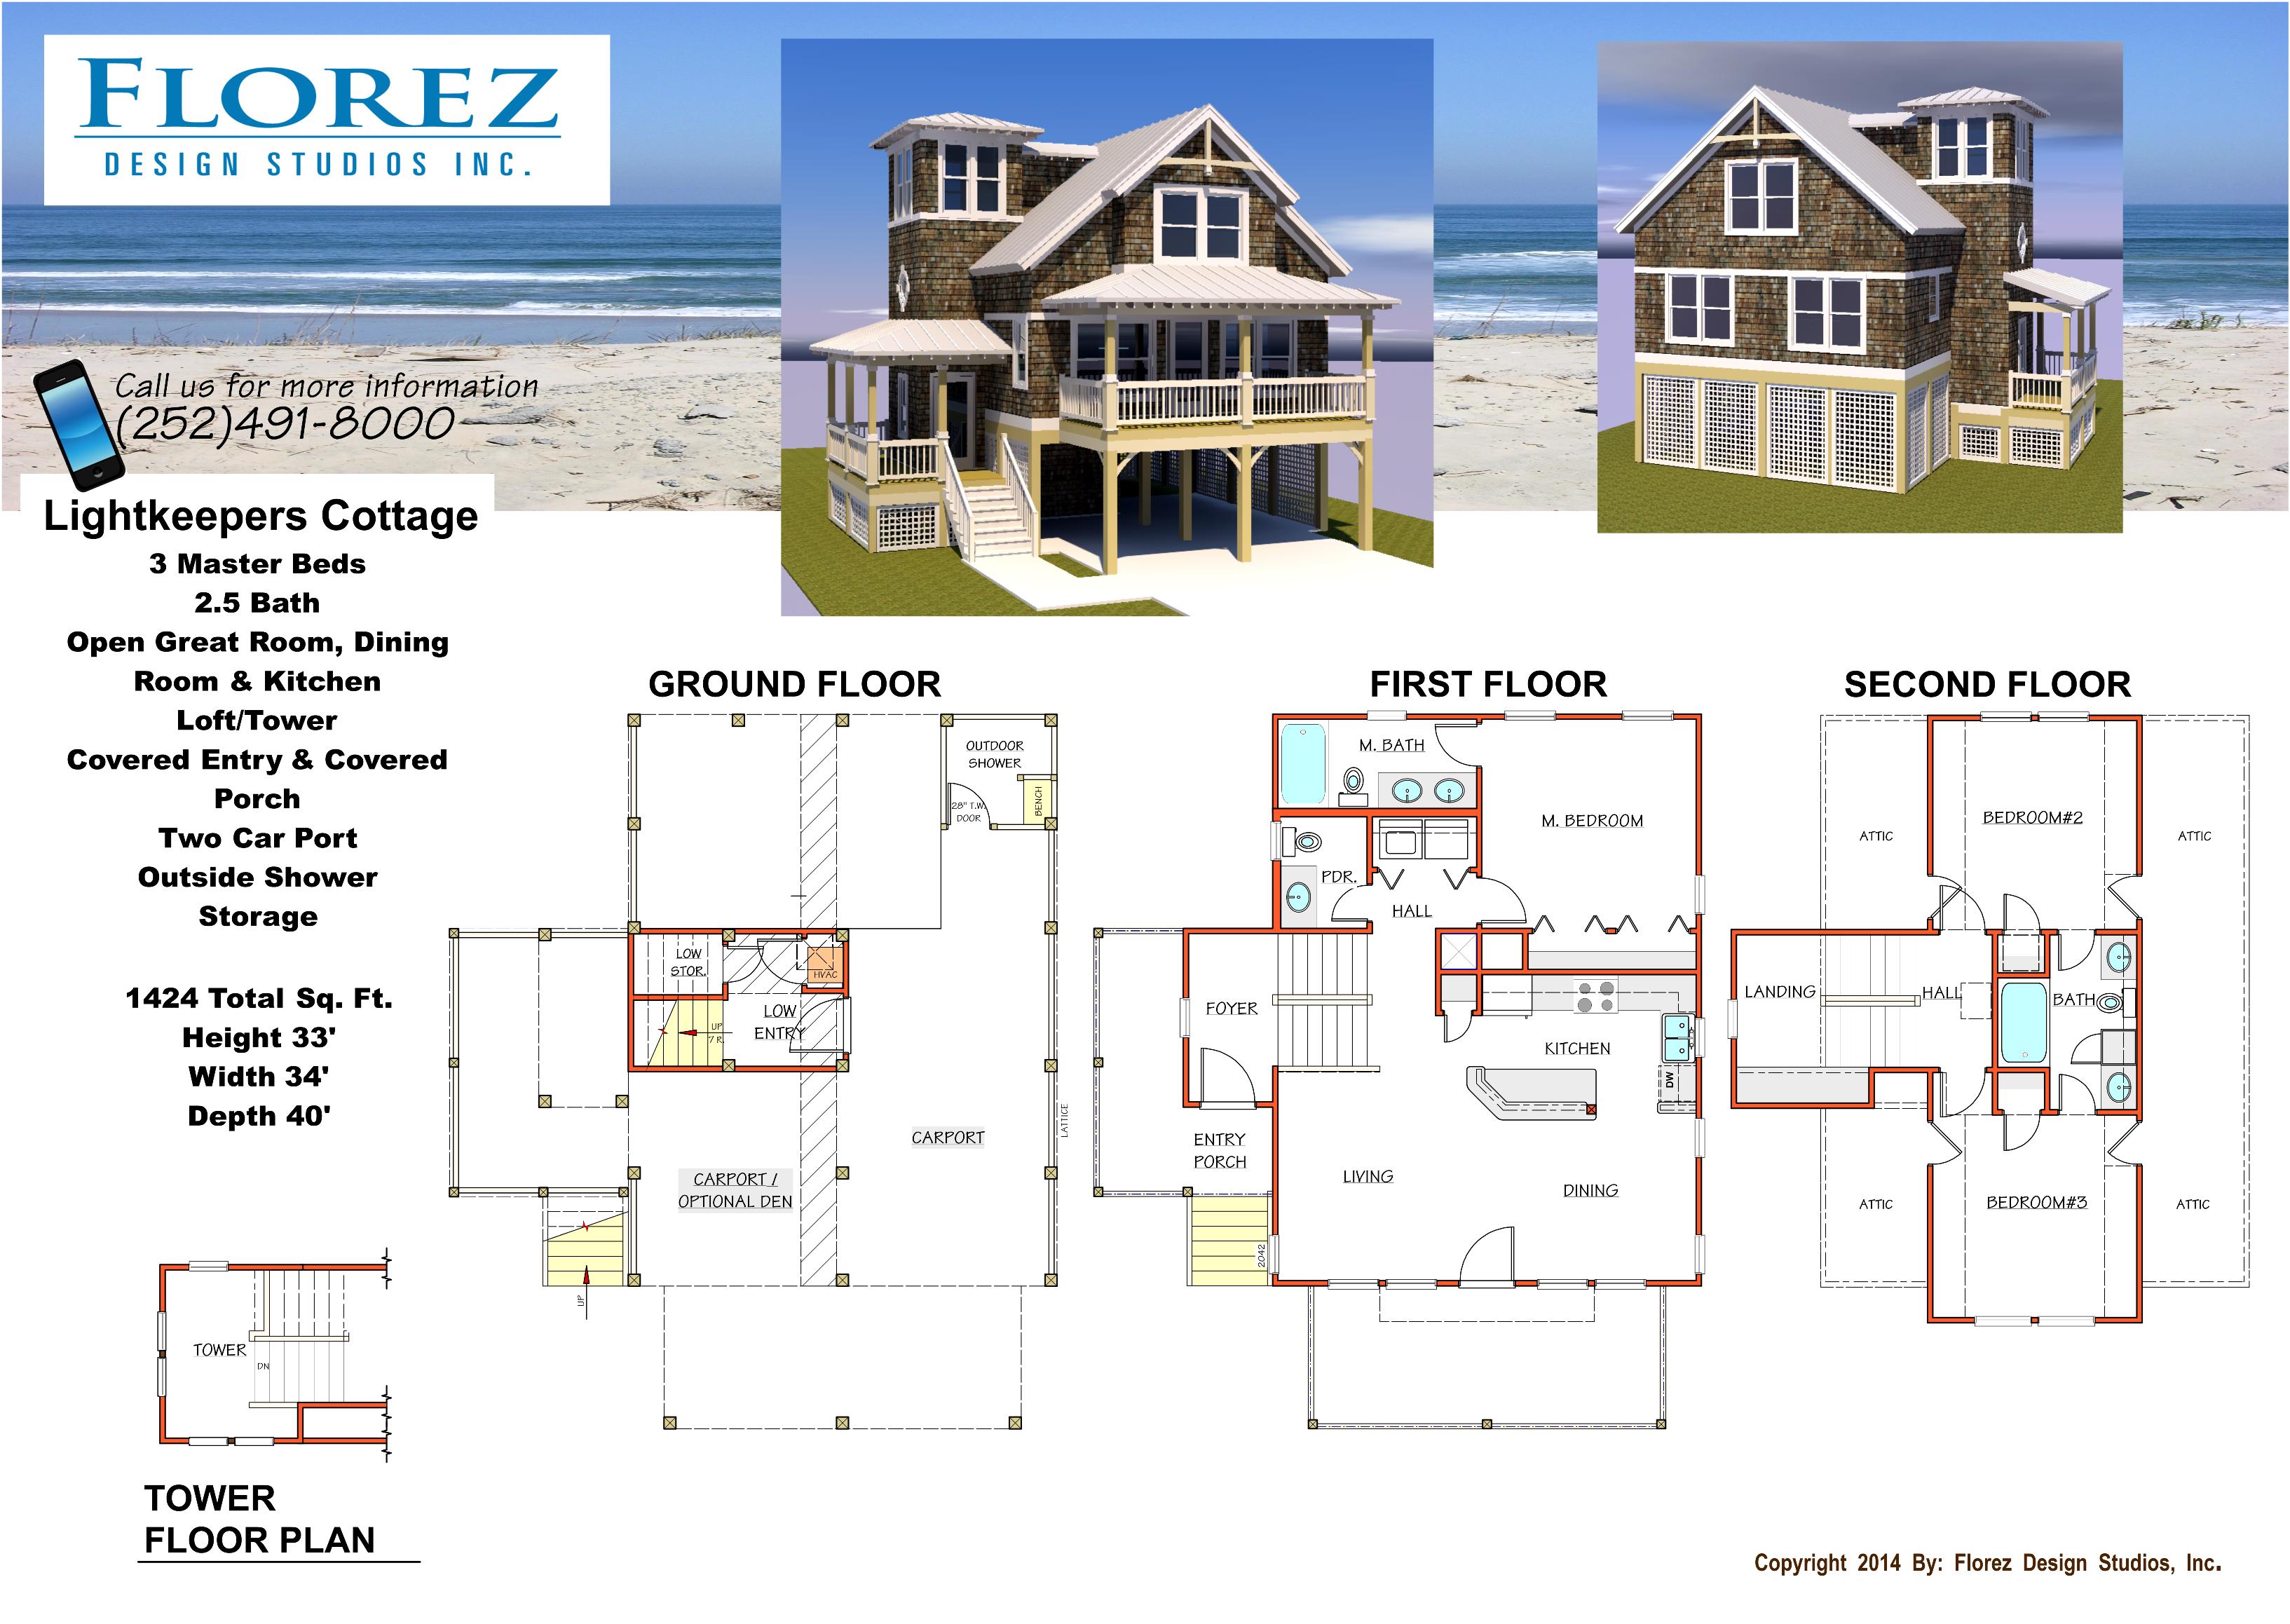 House plans 8000 sq ft house interior for Floor plans 8000 square feet